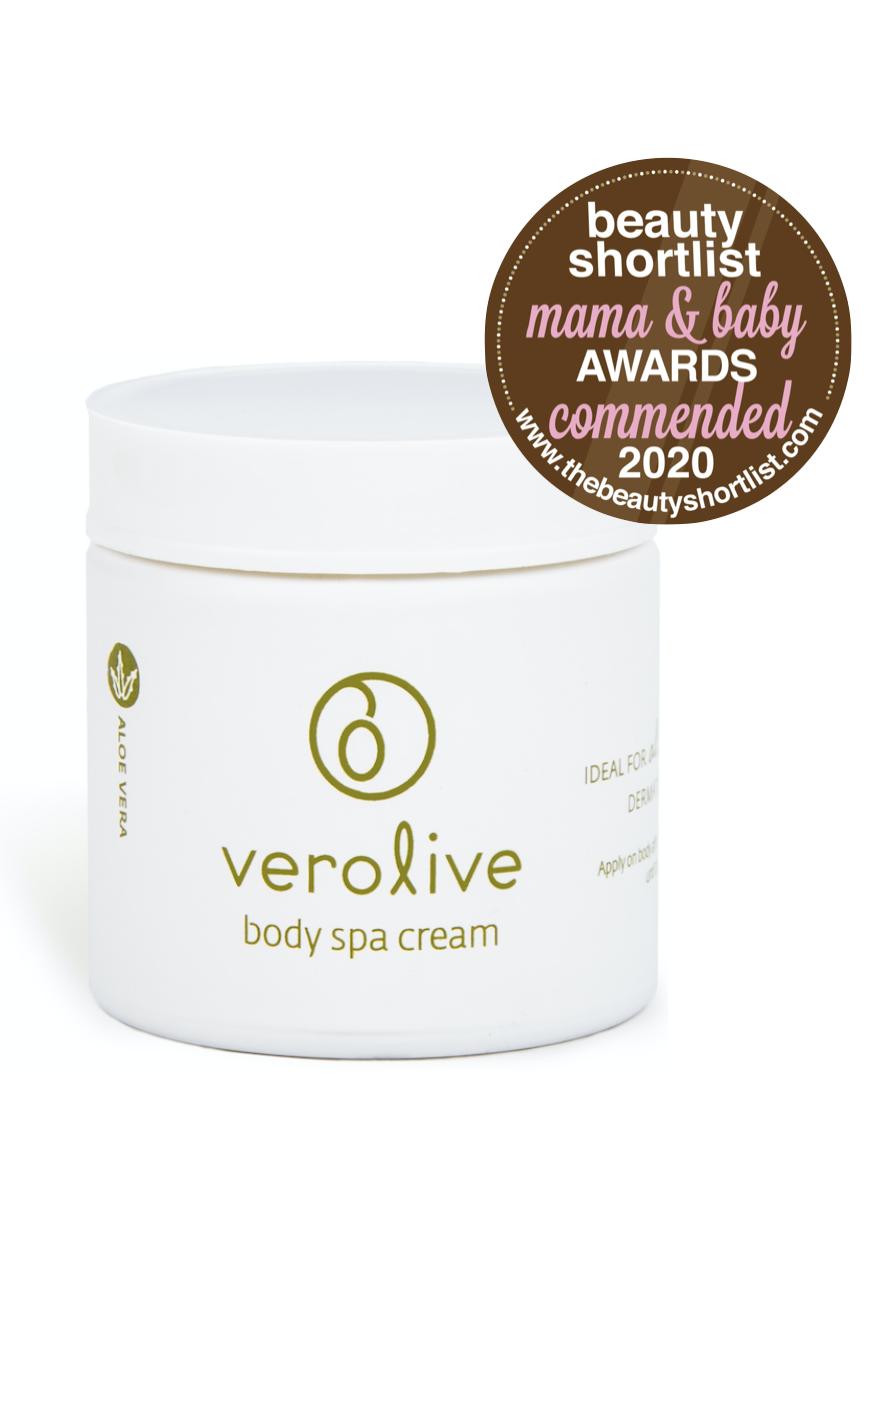 Award-Winning Aloe Vera body spa cream Ultra-rich